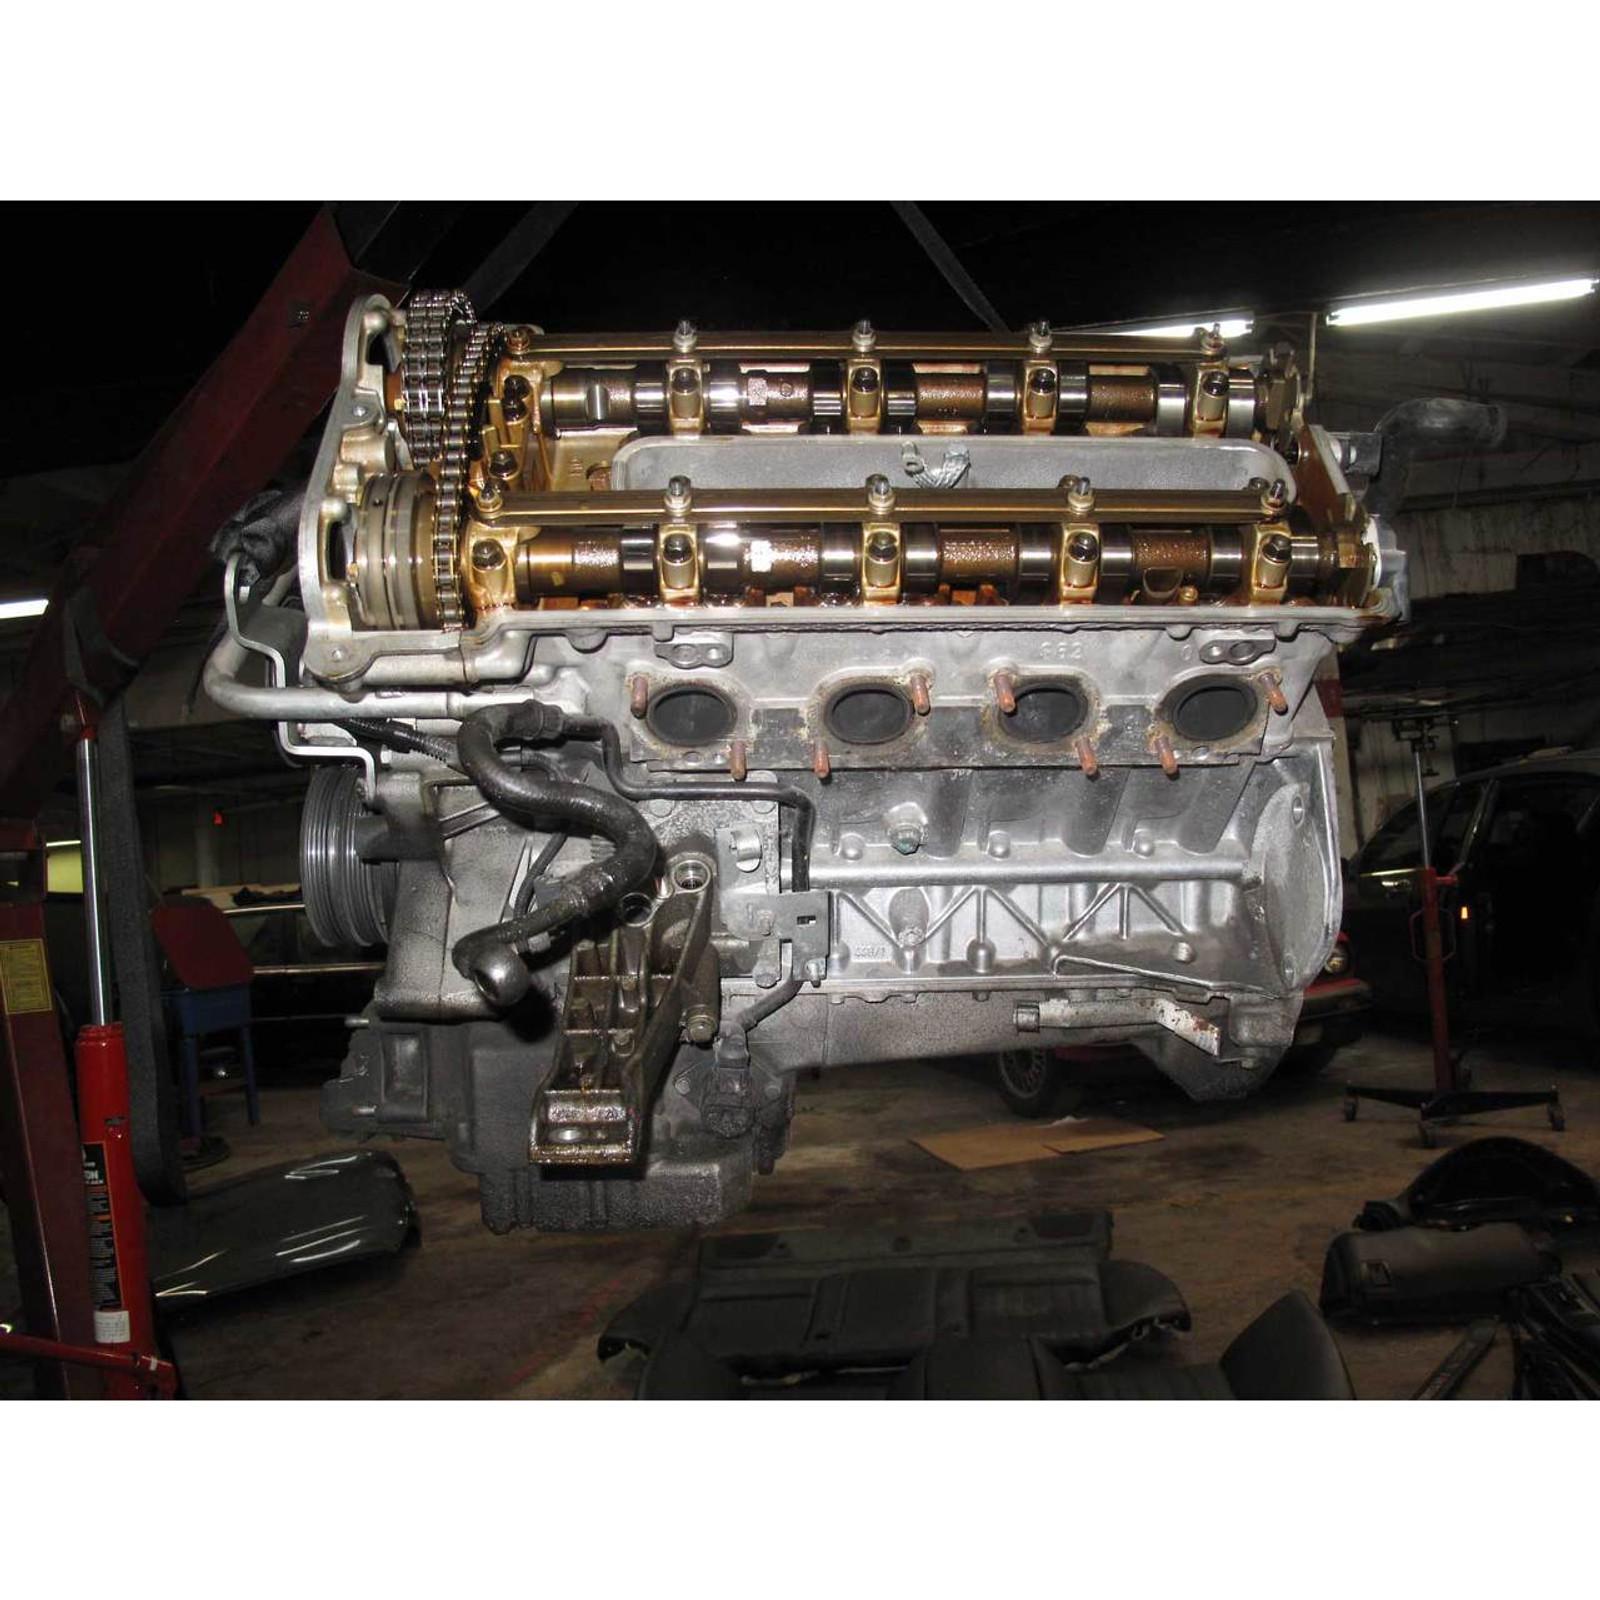 2000-2003 BMW E39 M5 ///M S62 5 0L V8 Engine Assembly Long Block Running  OEM - 19508